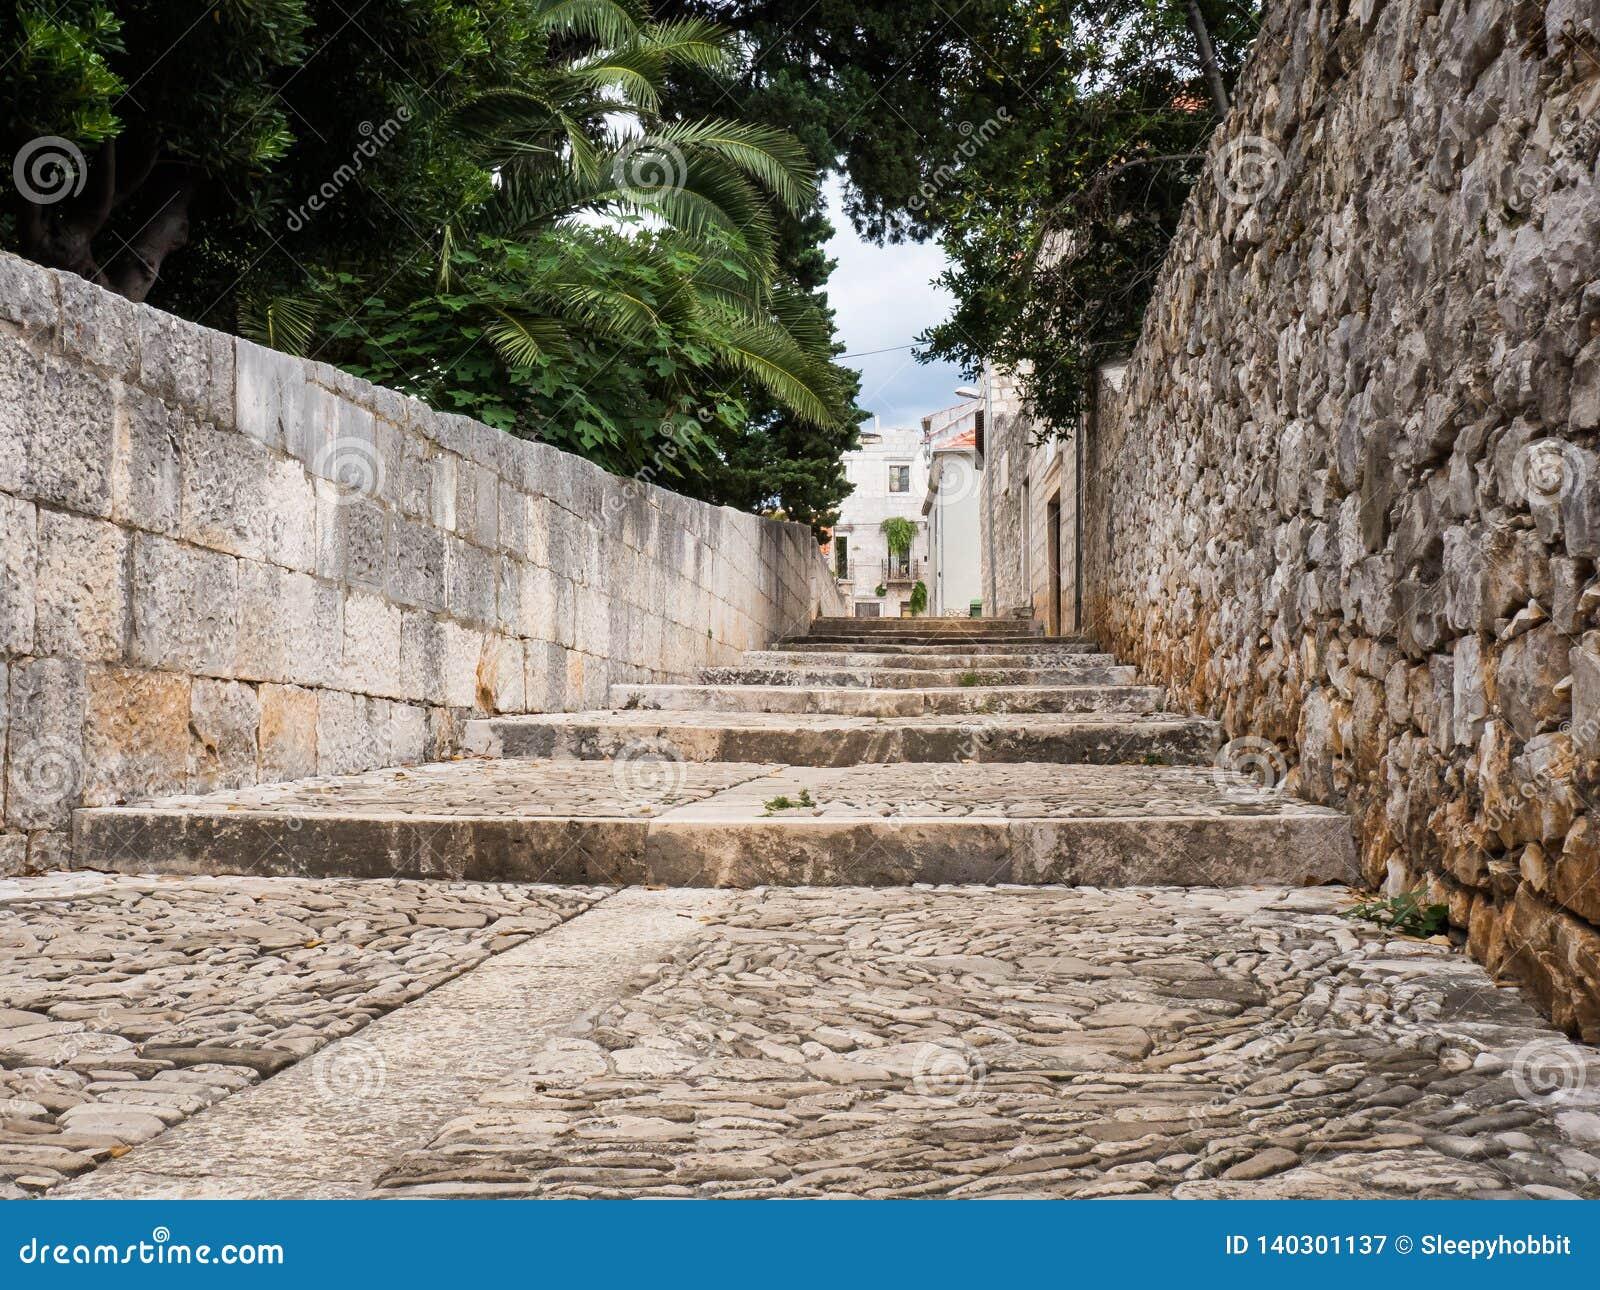 Old street in Sucuraj, Hvar island, Croatia with stairs